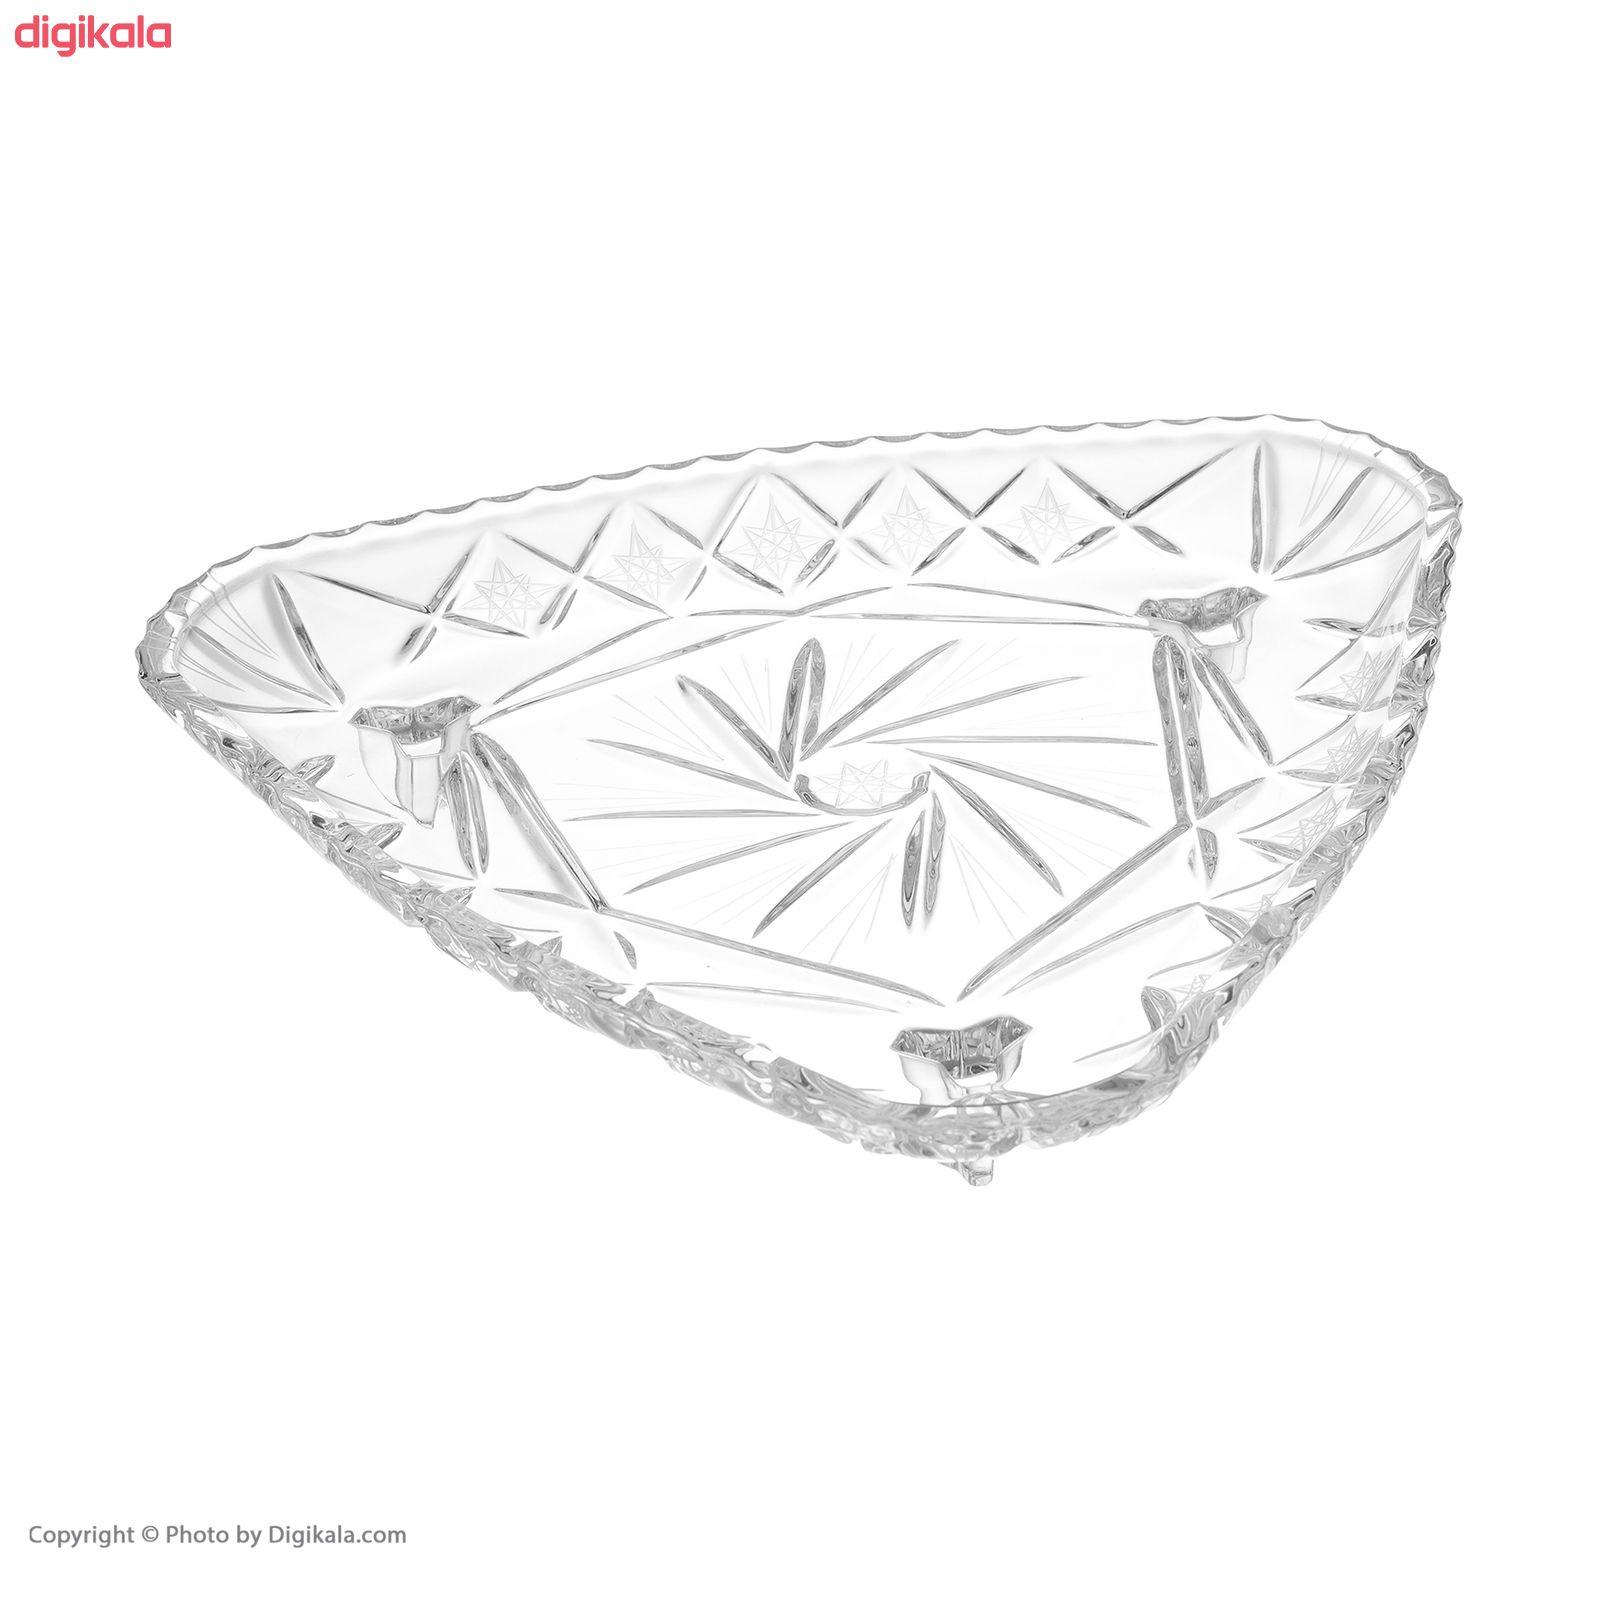 شیرینی خوری جهان کریستال سری هریس کد 40561  main 1 3